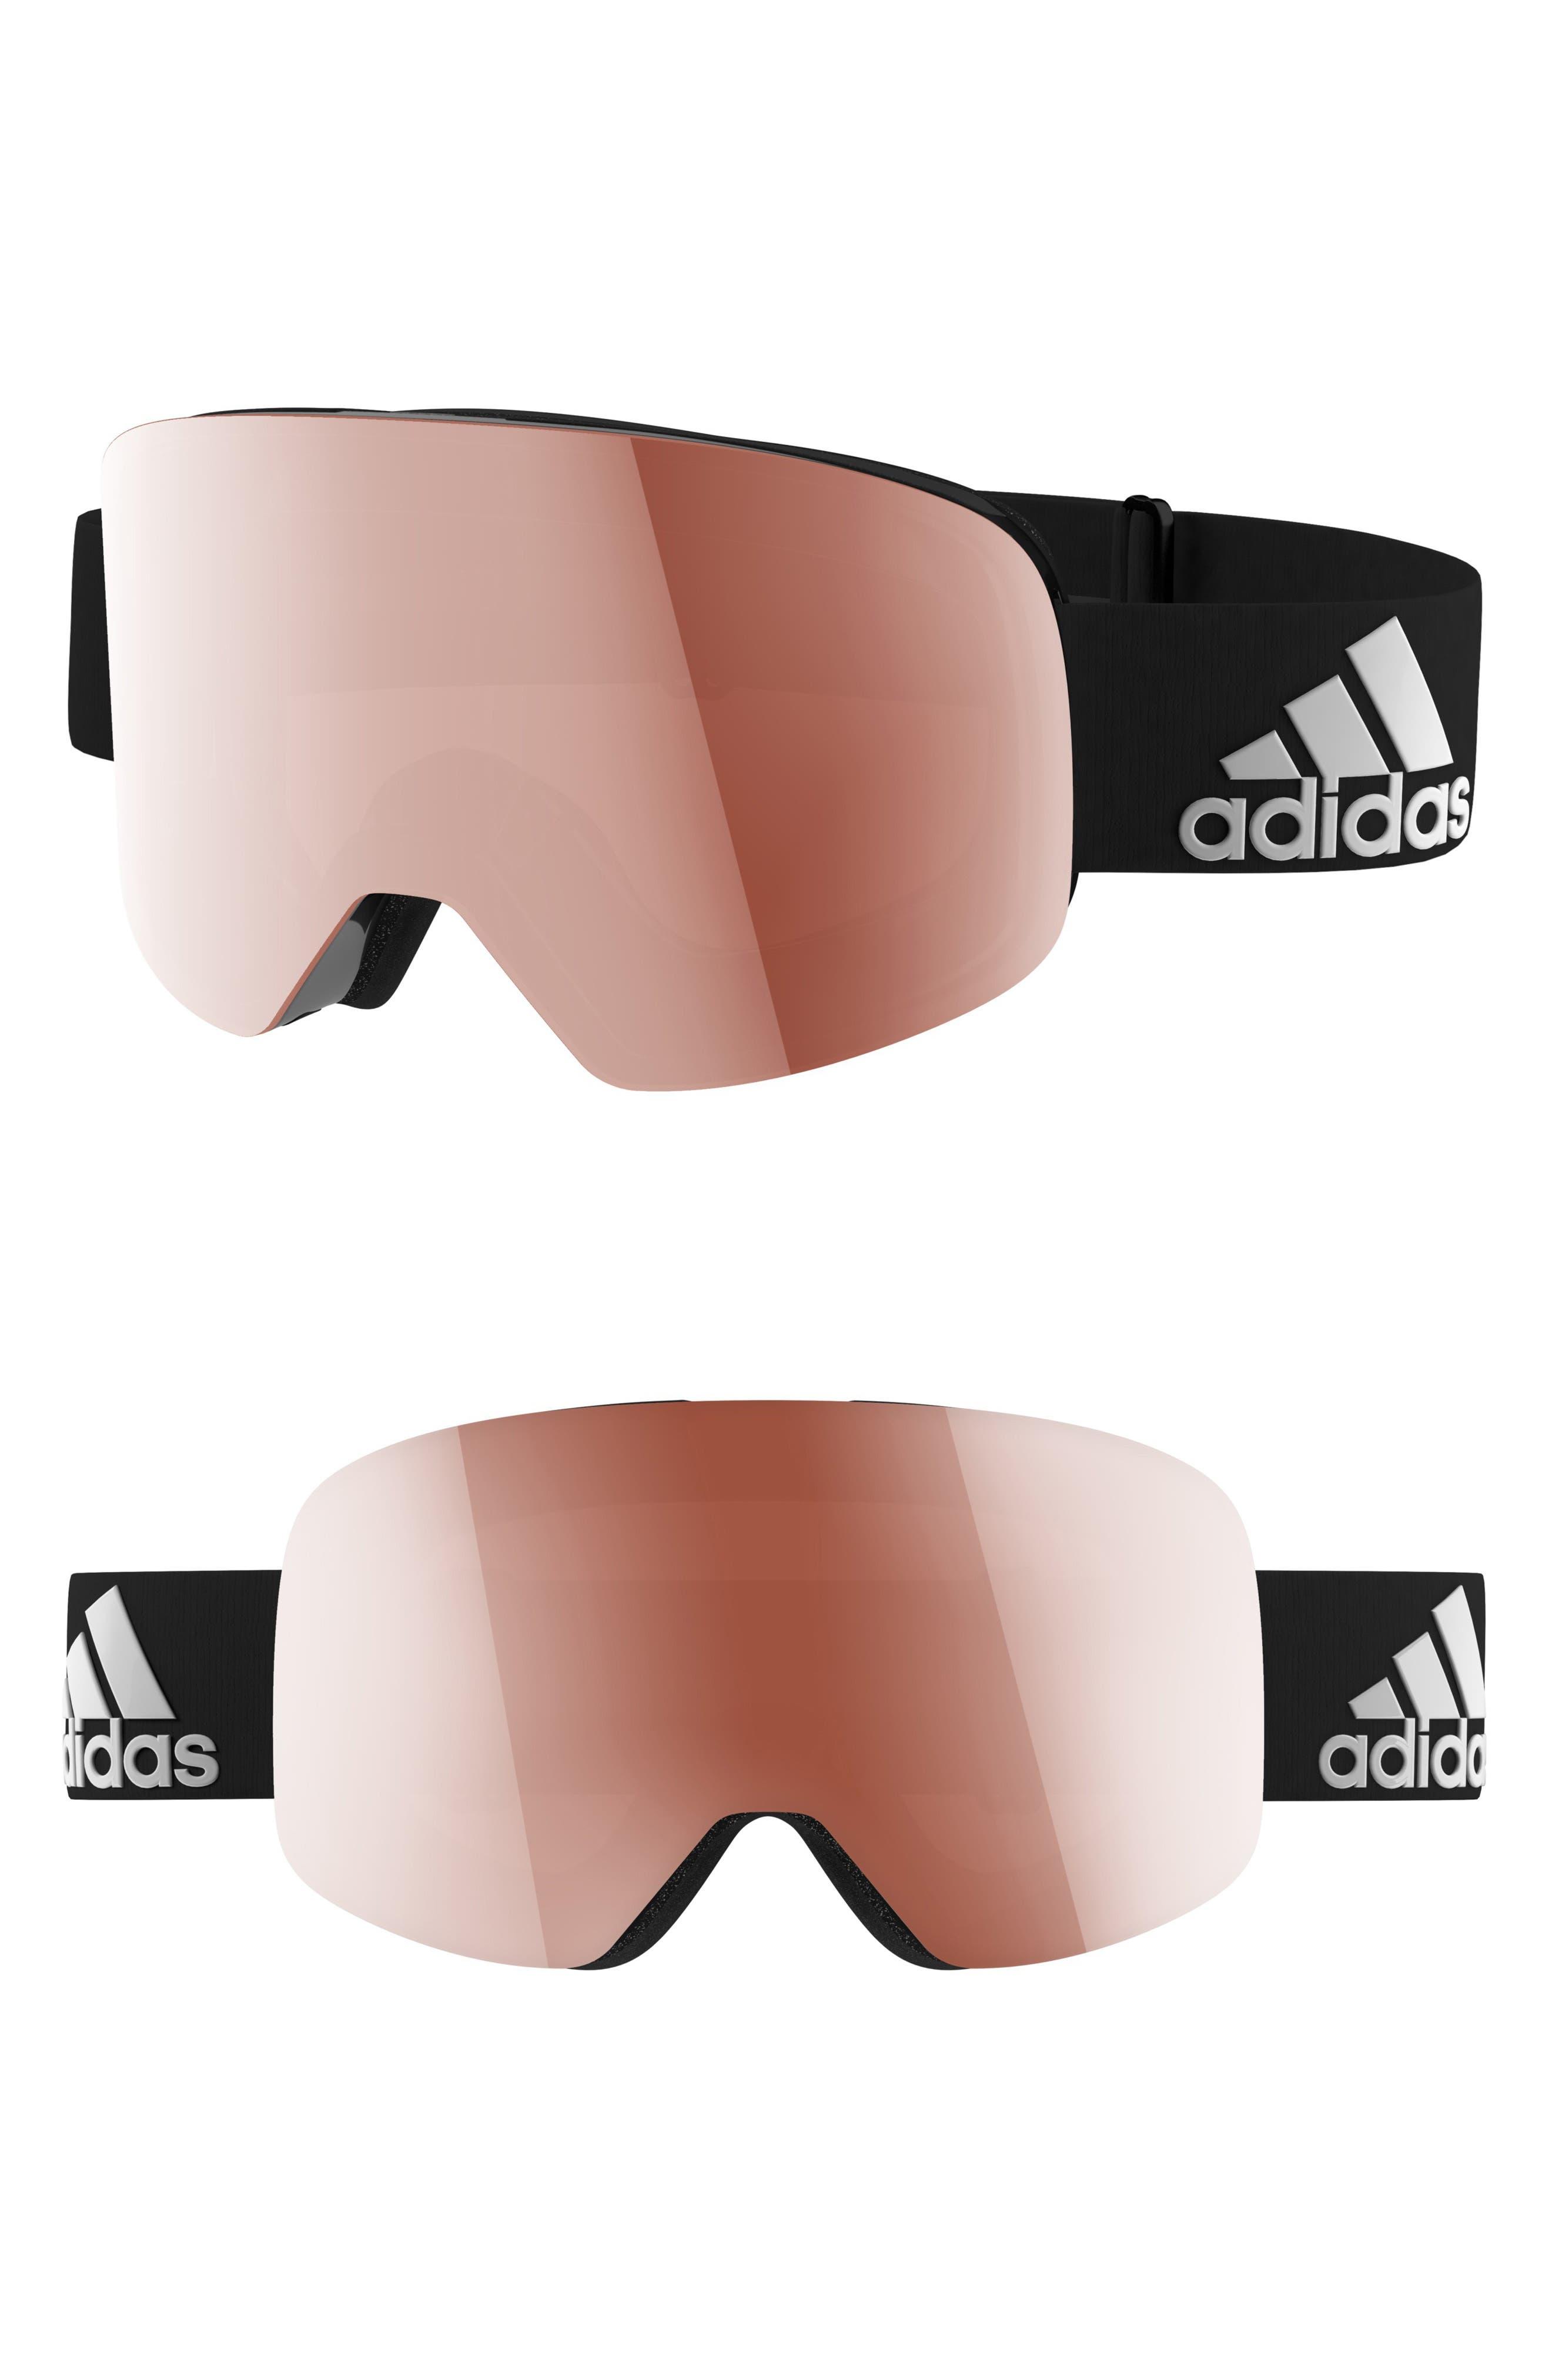 Backland Spherical Snowsports Goggles,                             Main thumbnail 1, color,                             SHINY BLACK/ ACTIVE SILVER